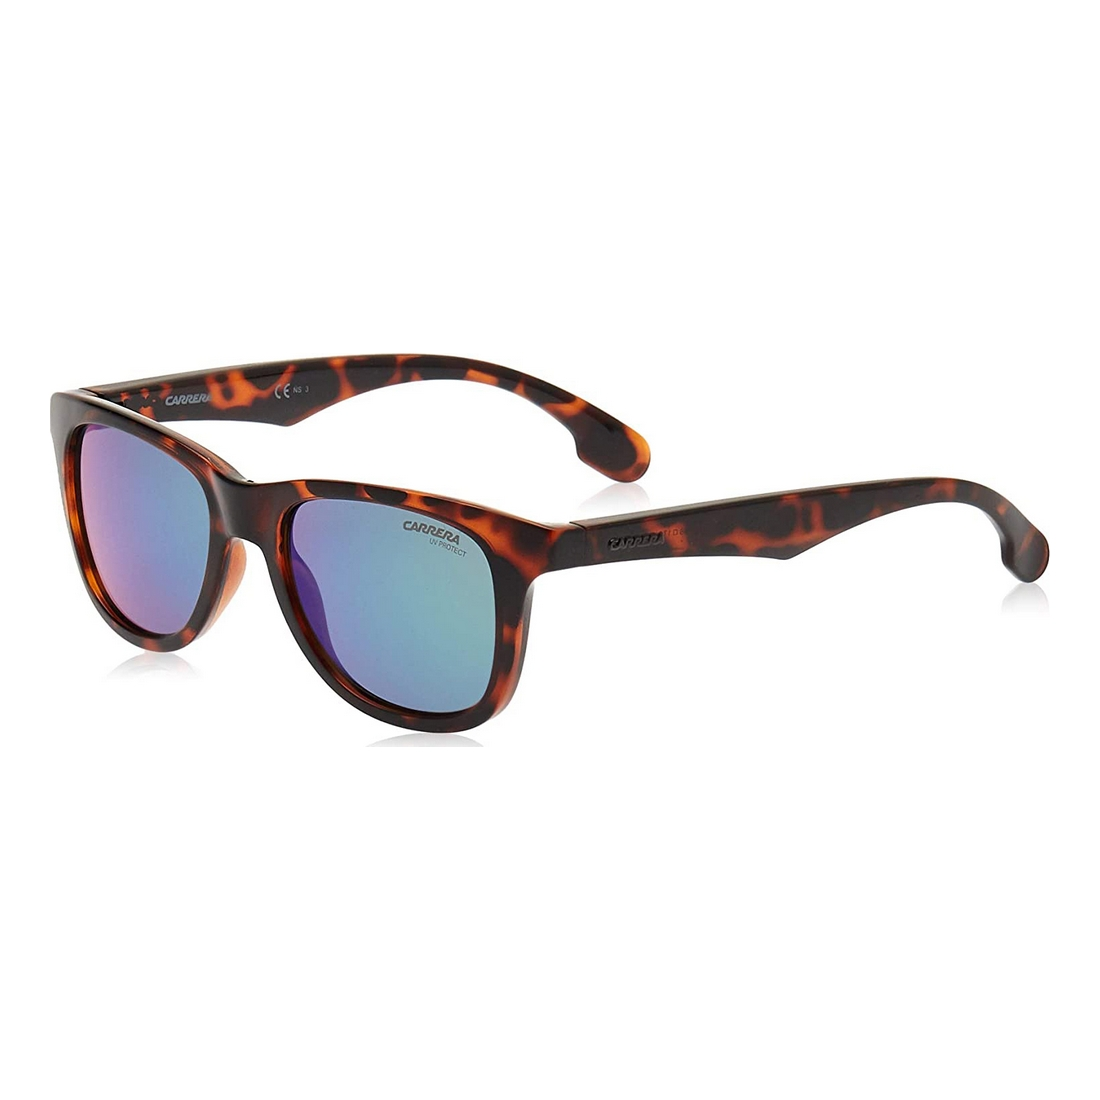 Child Sunglasses Carrera 20-08646Z9 (Ø 46 mm)